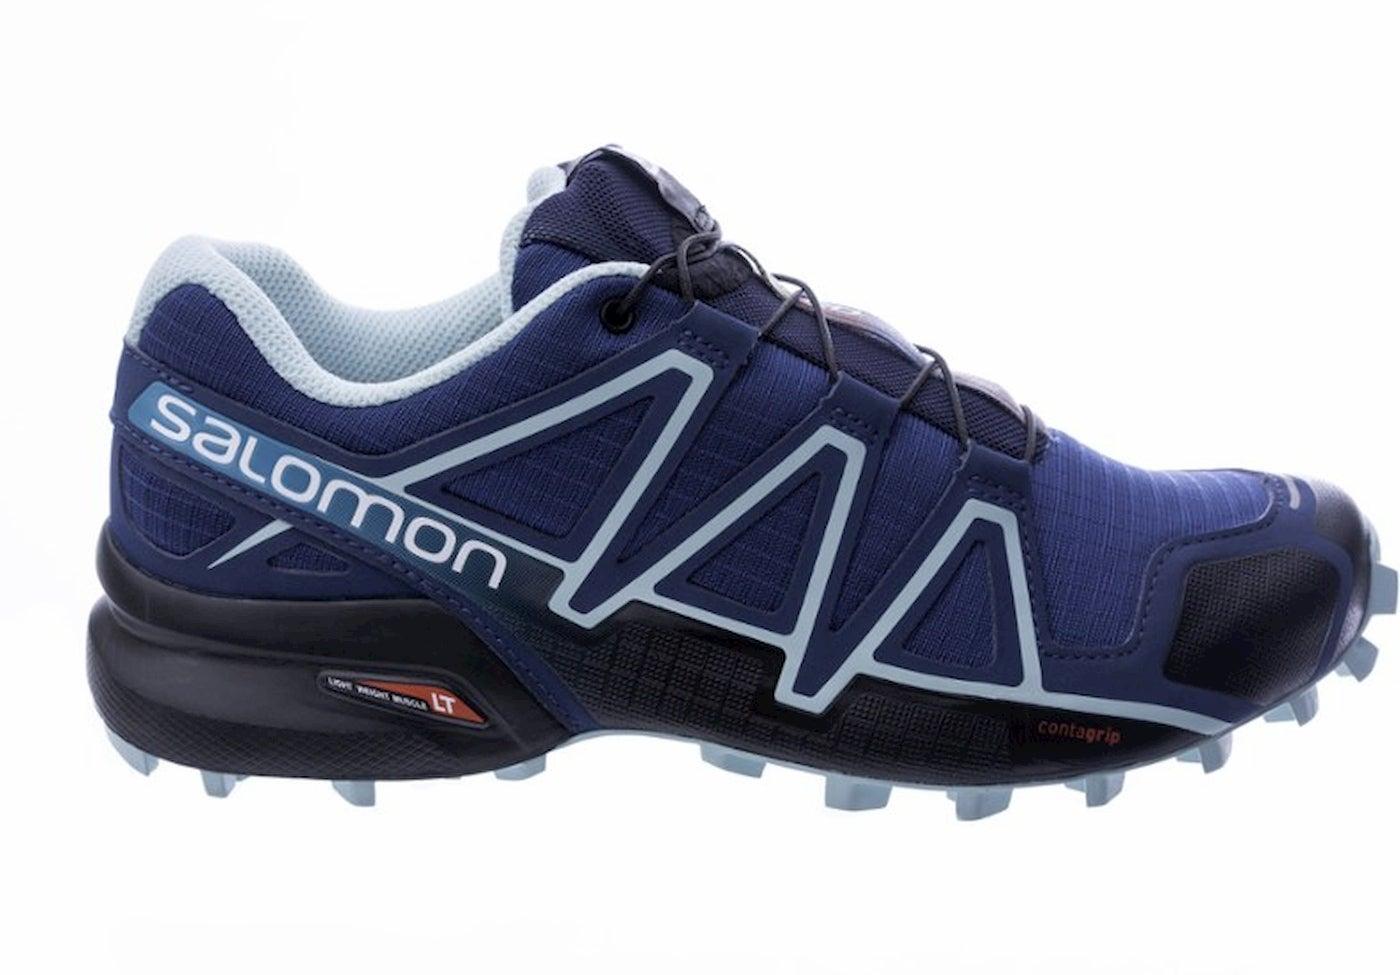 Salomon Speedcross 4 shoe in dark and light blue